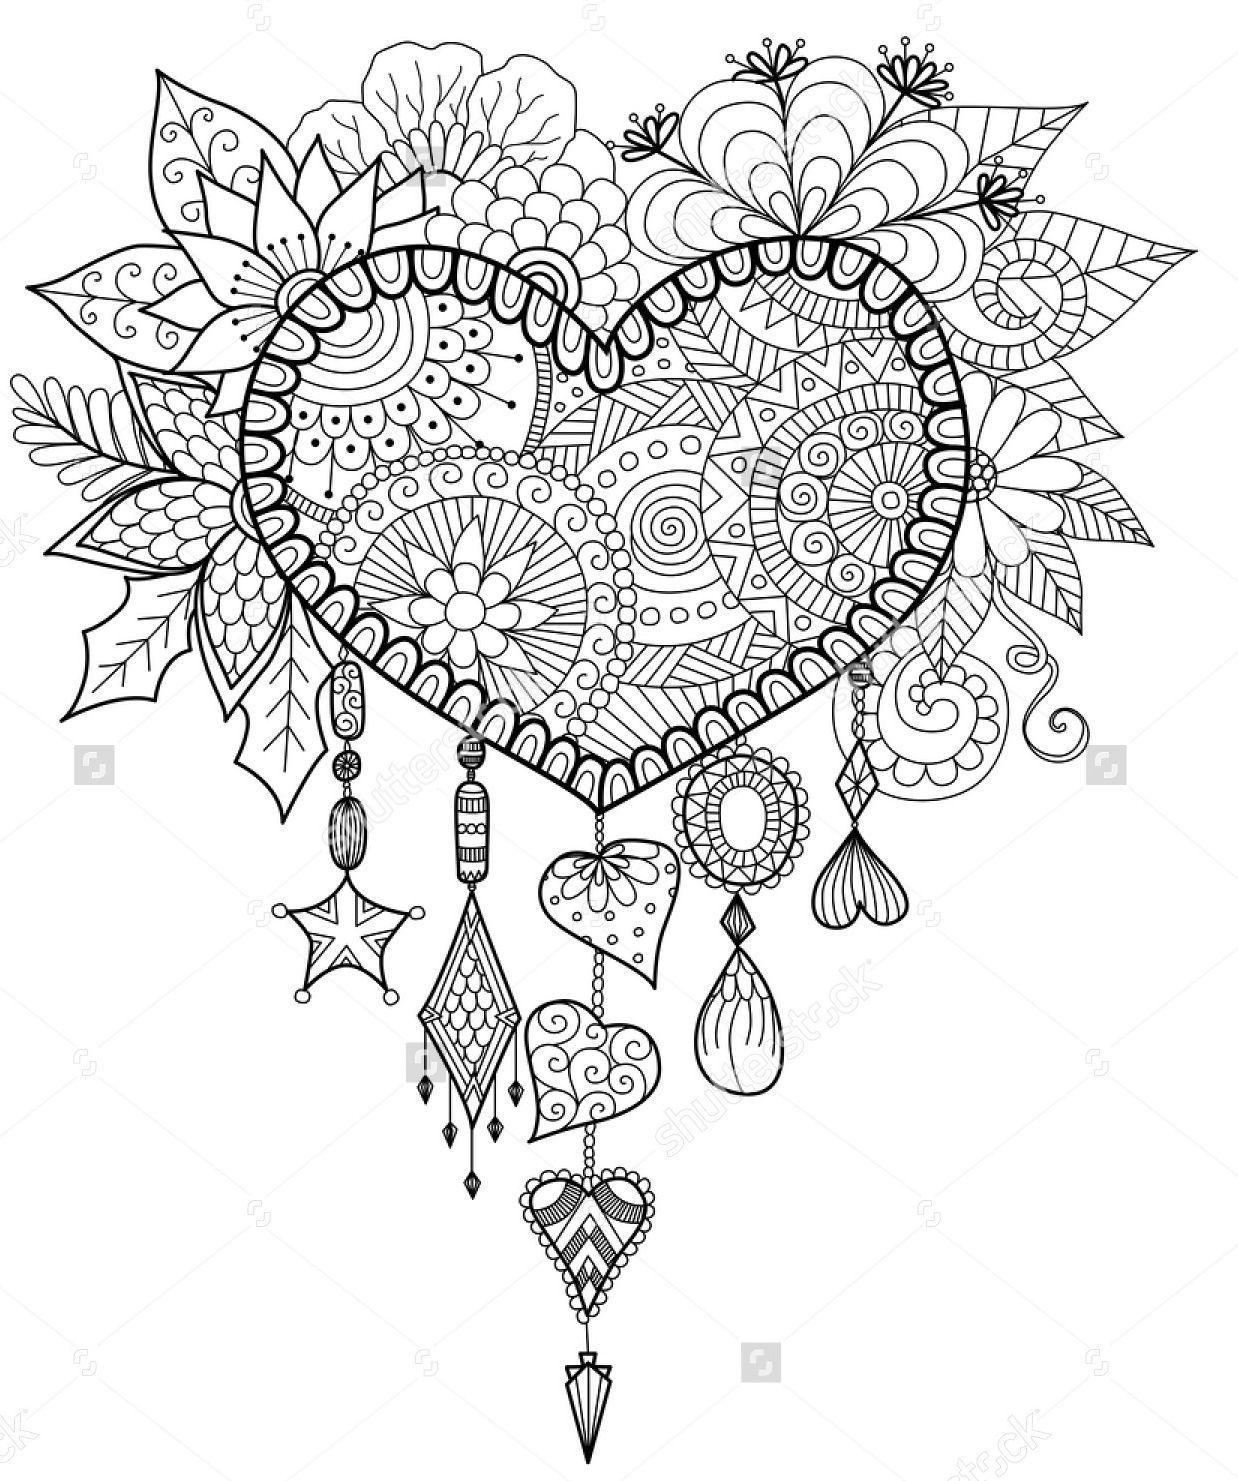 Heart Shaped Floral Dreamcatcher Shutterstock Heart Coloring